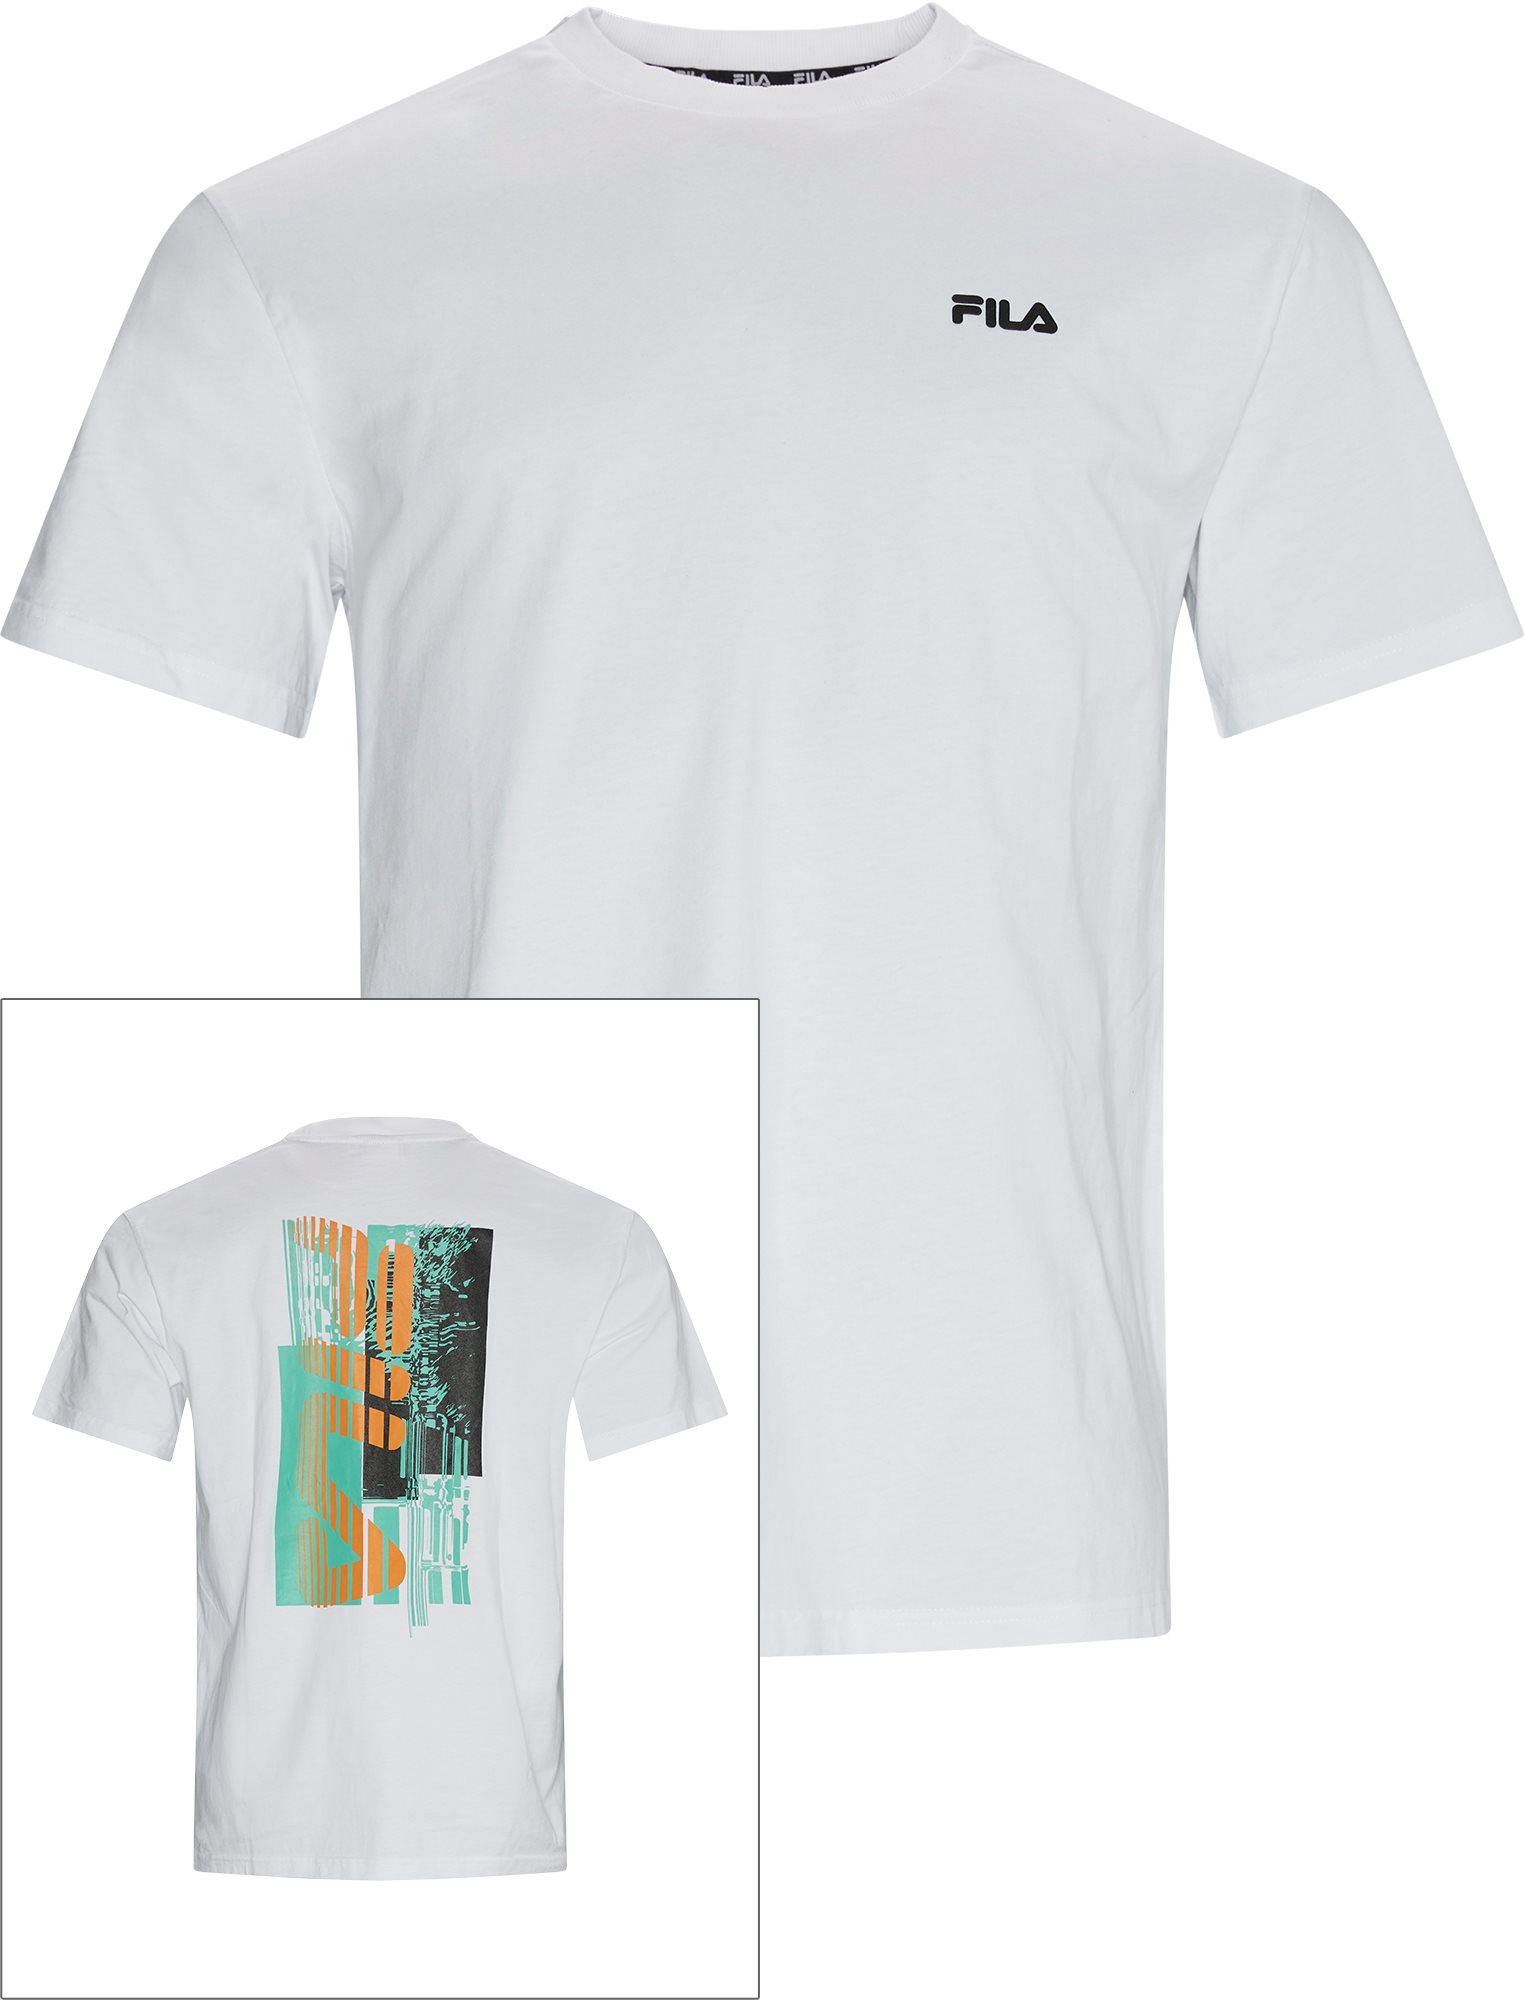 Abay Drop Tee - T-shirts - Regular fit - Hvid